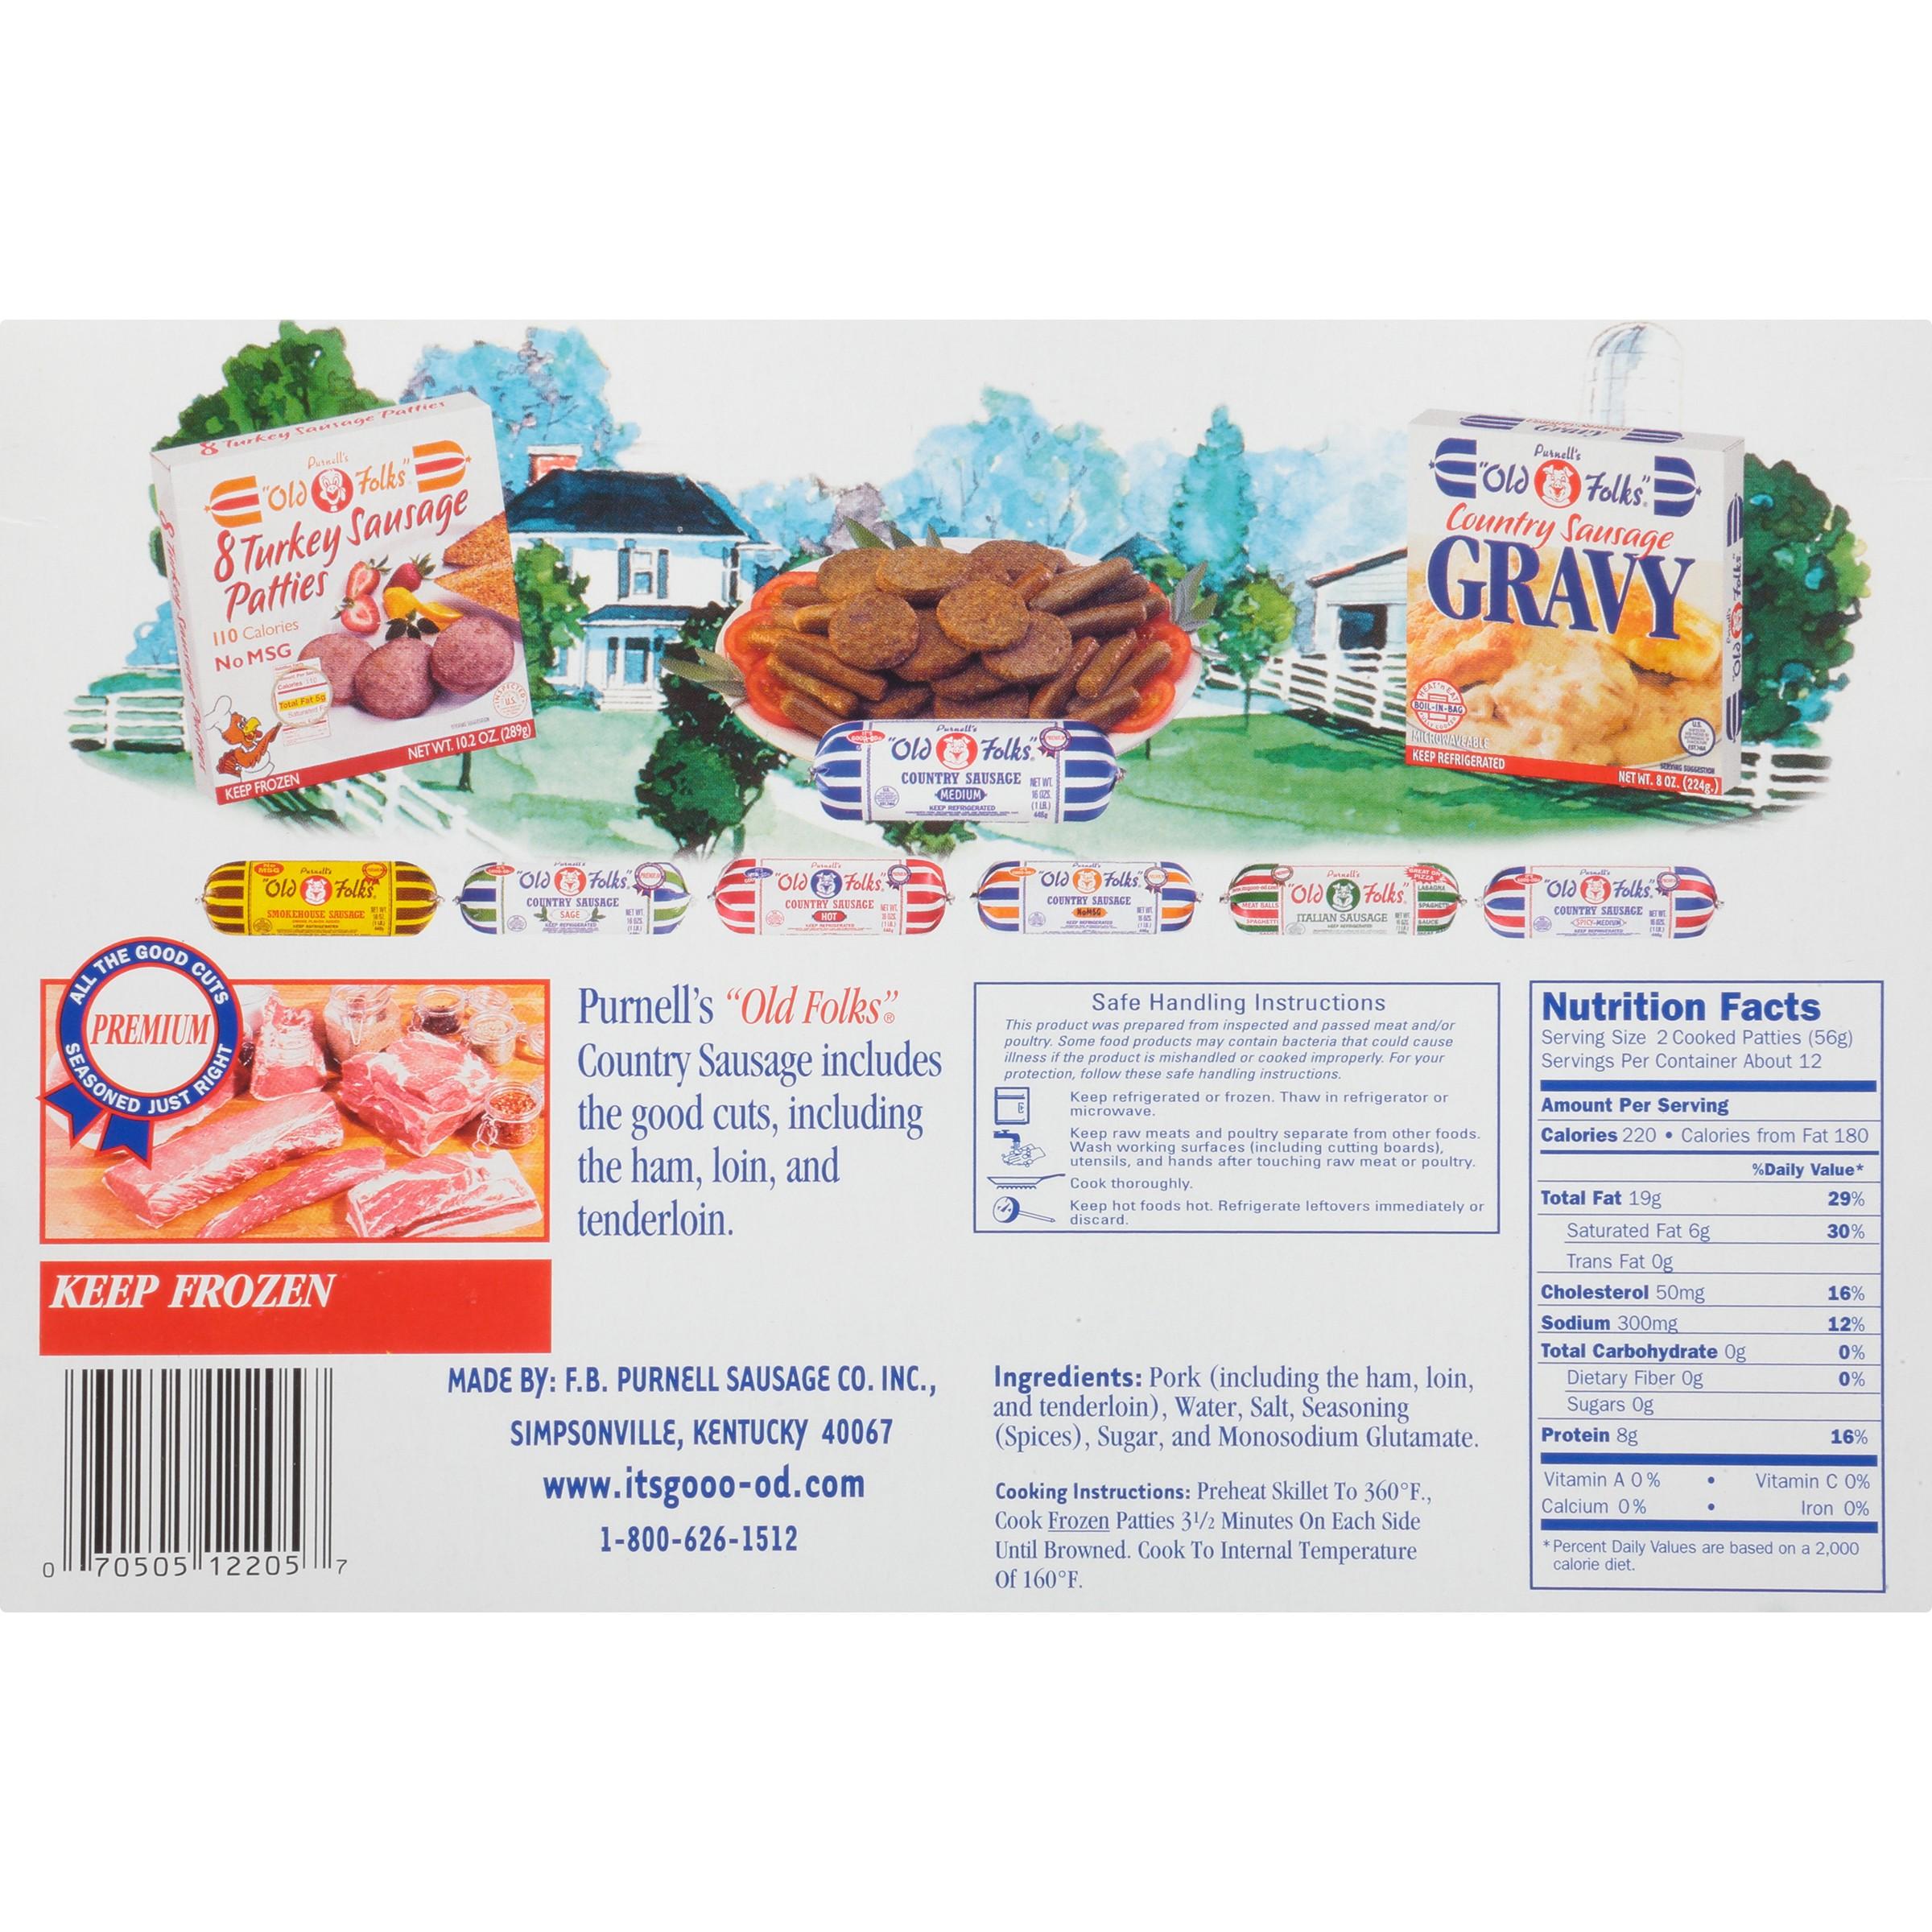 purnell s old folks medium patties 24 ct country sausage 38 oz box walmart com